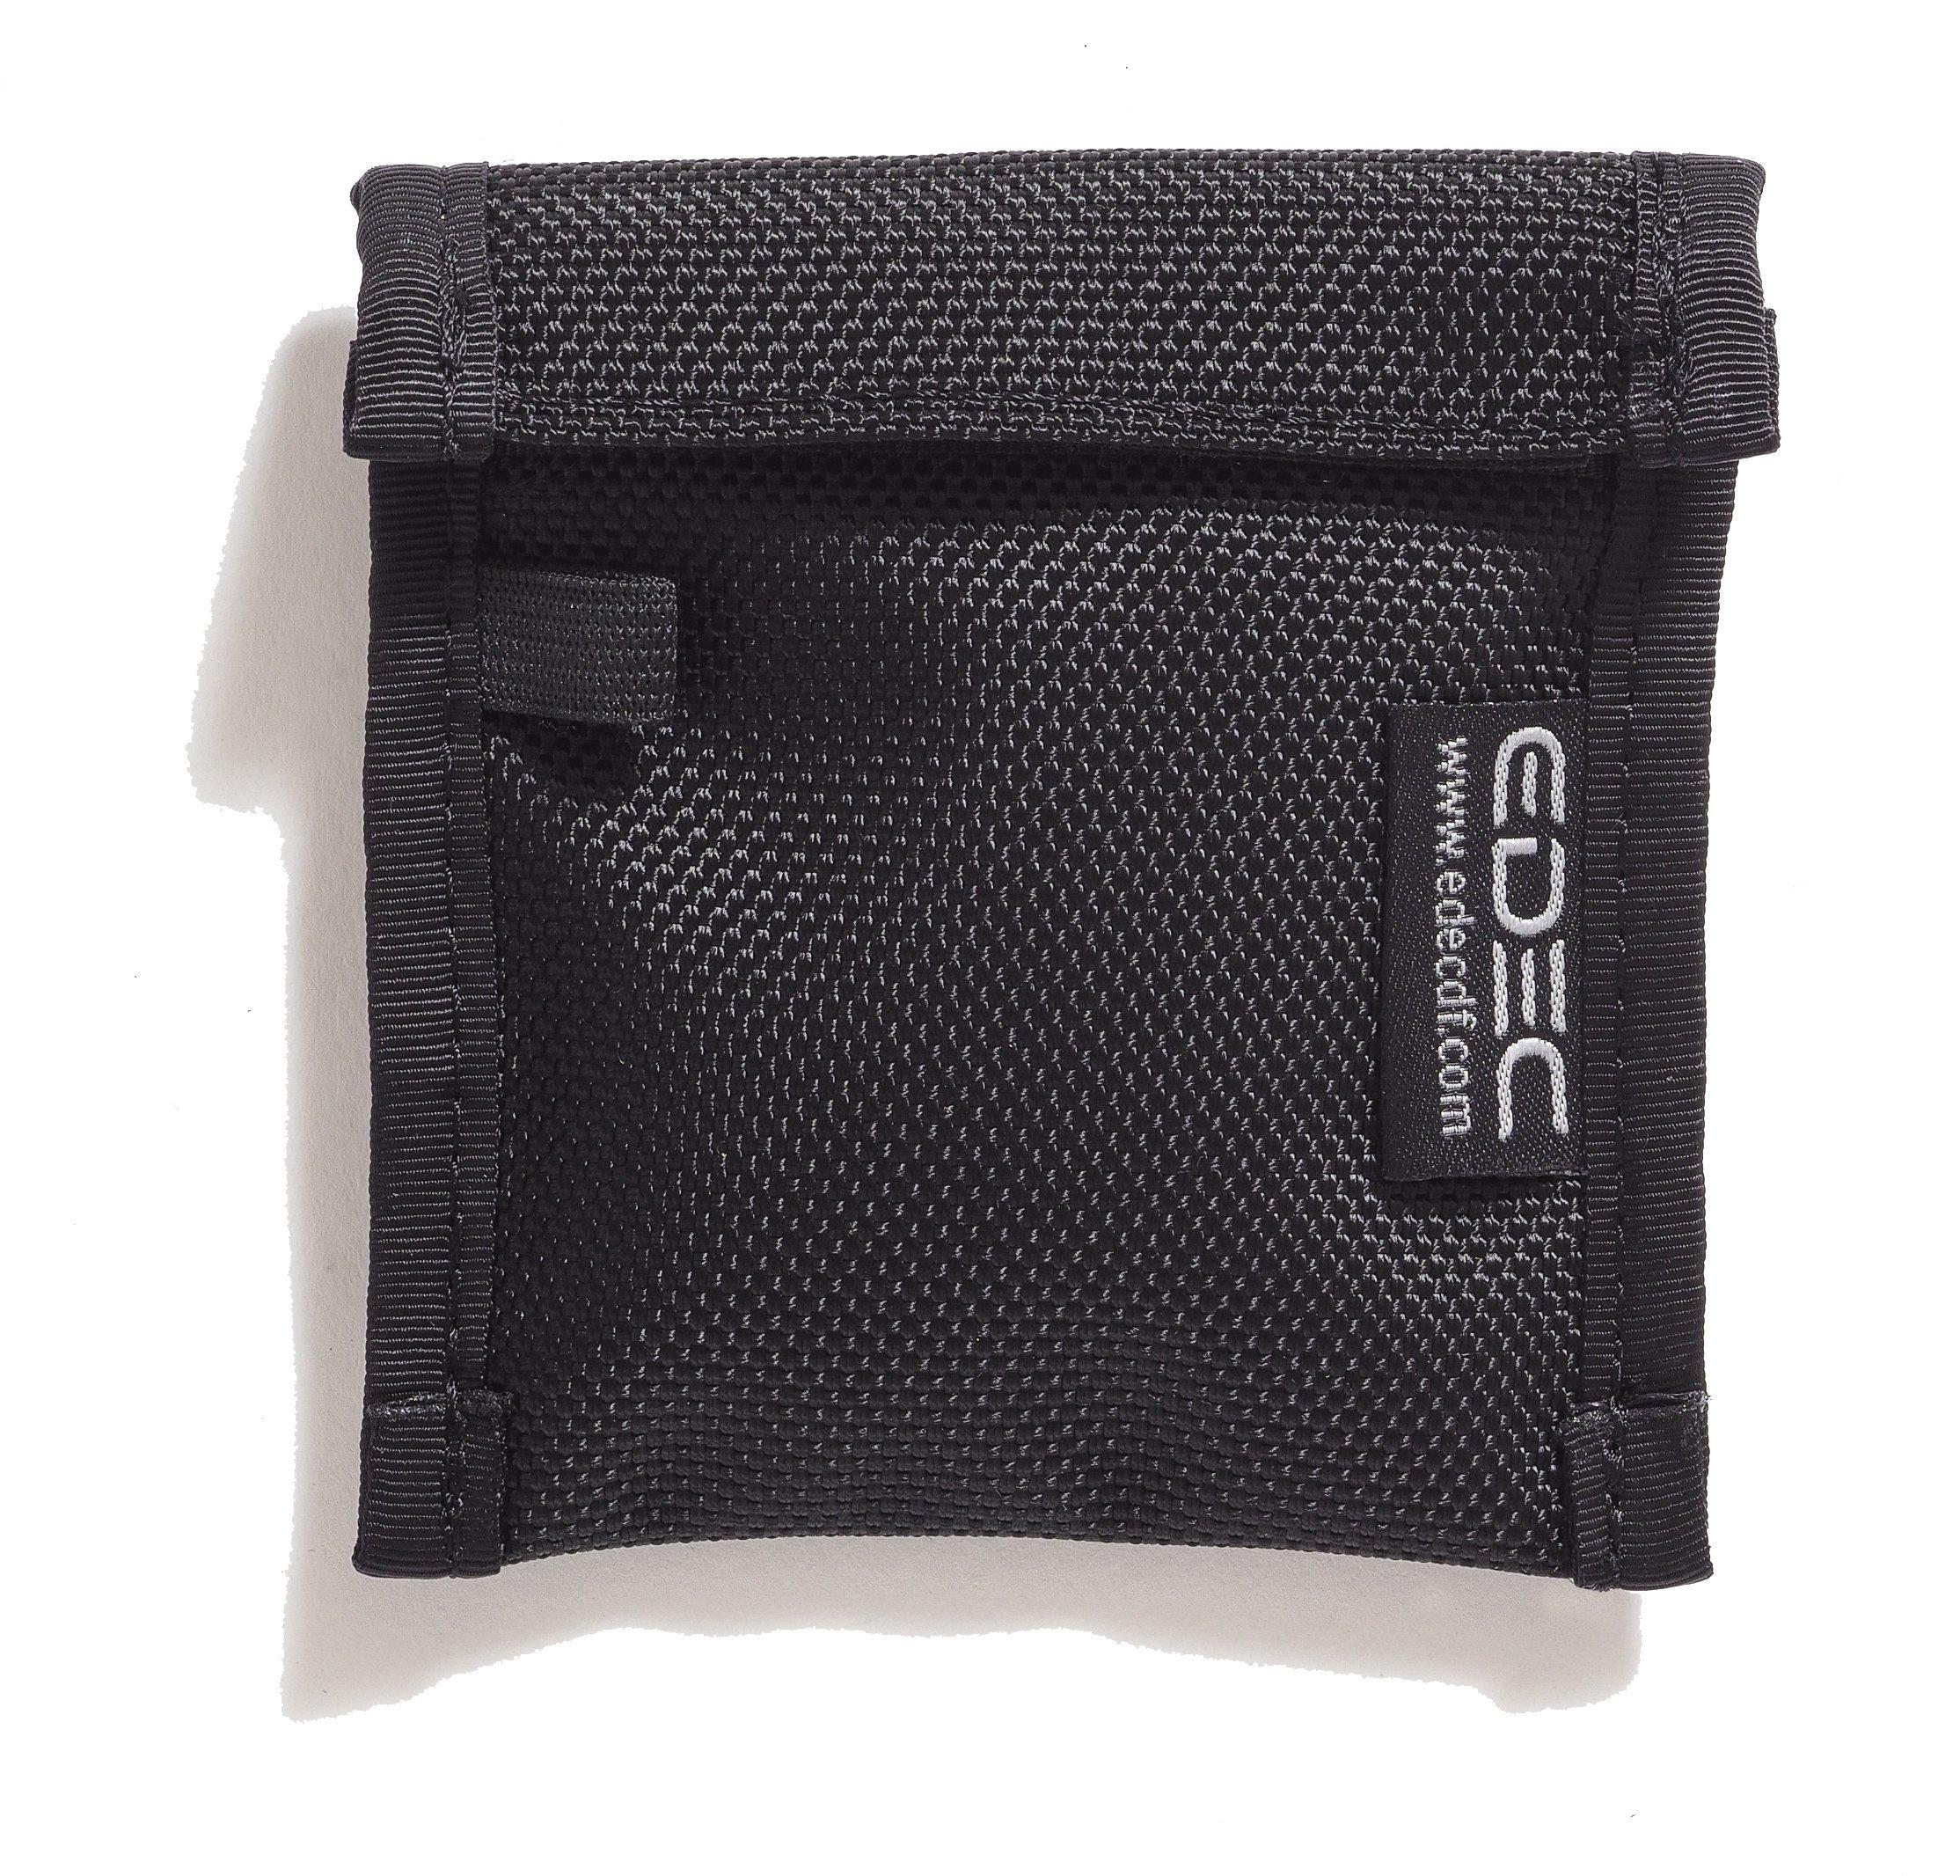 Black Hole Faraday Key Fob Bag - Anti-hacking Security Bag for your Key Fob